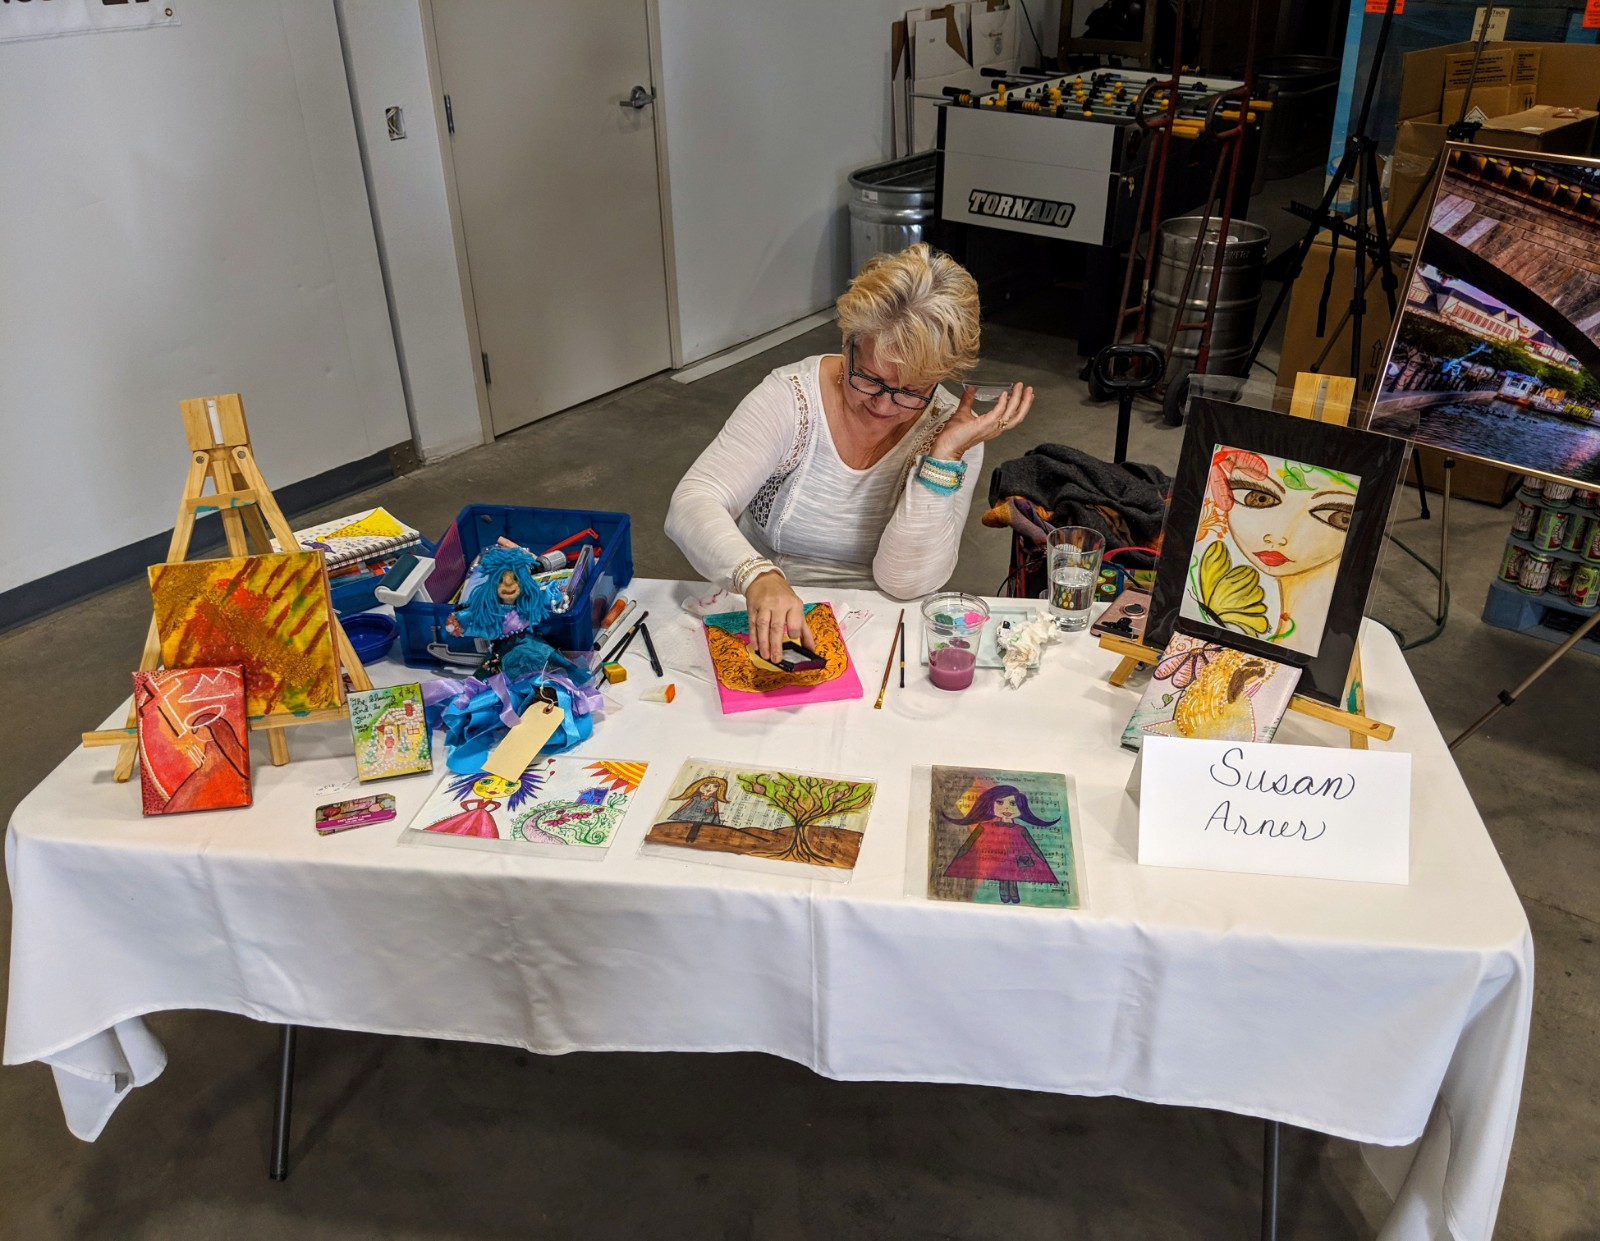 F.O.A.M. Celebrates Local Artists In Lake Havasu